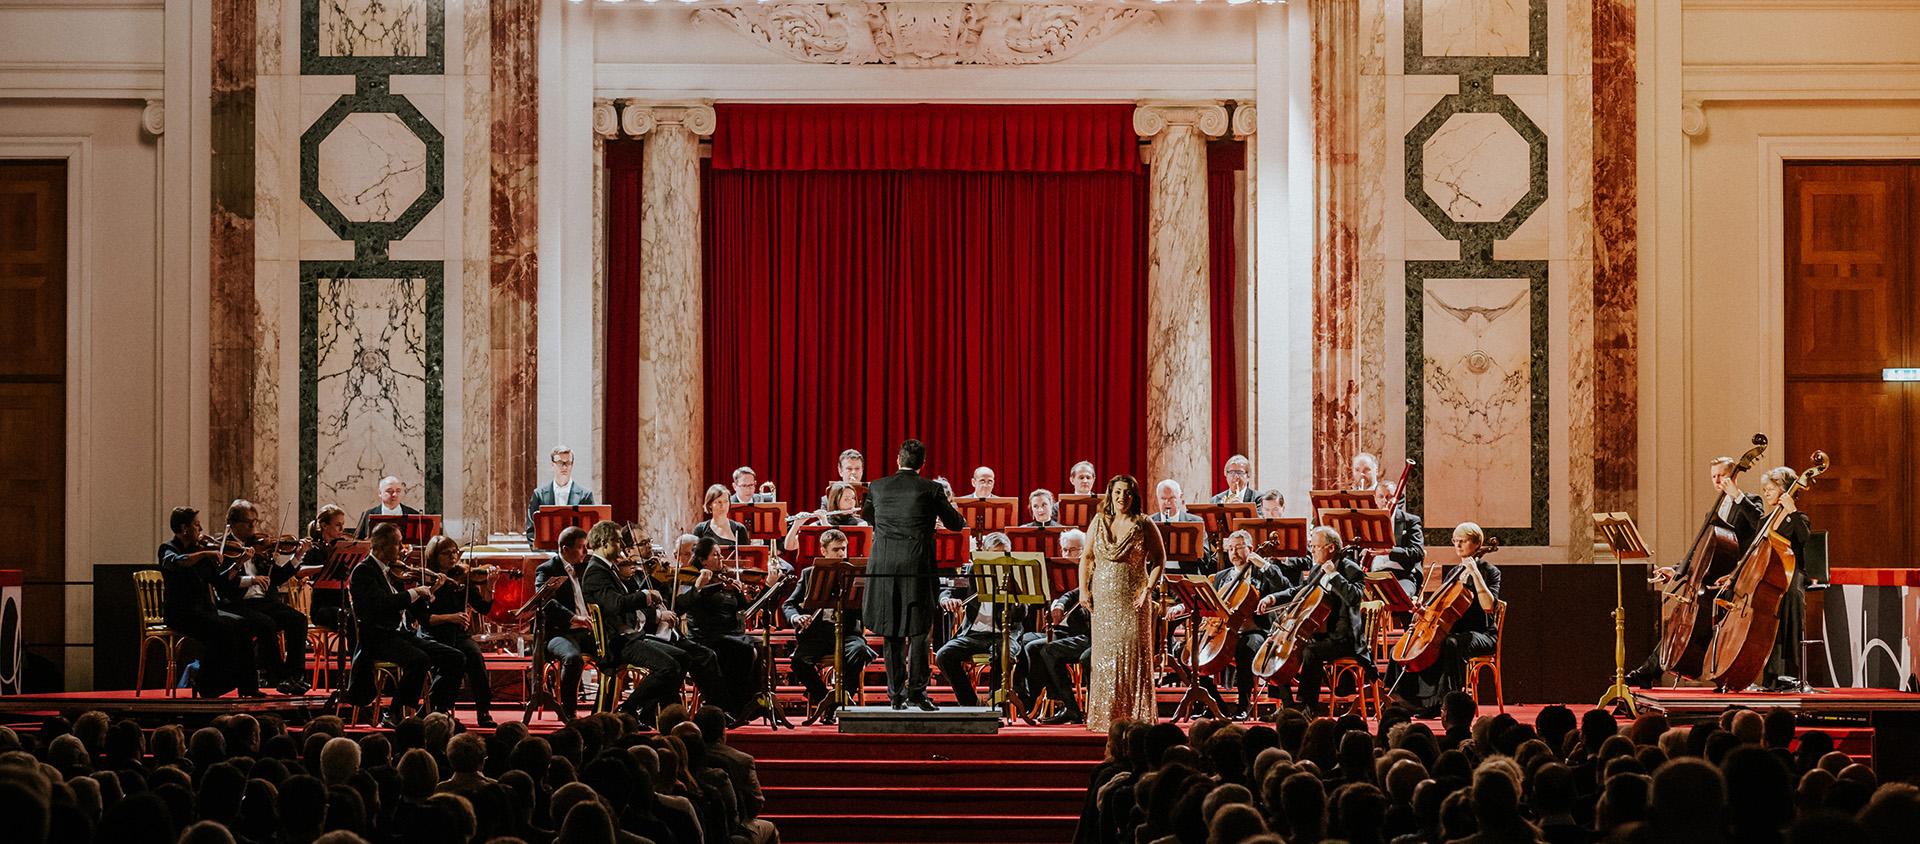 Selvana Salmasi在维也纳霍夫堡宫歌舞厅的古典音乐